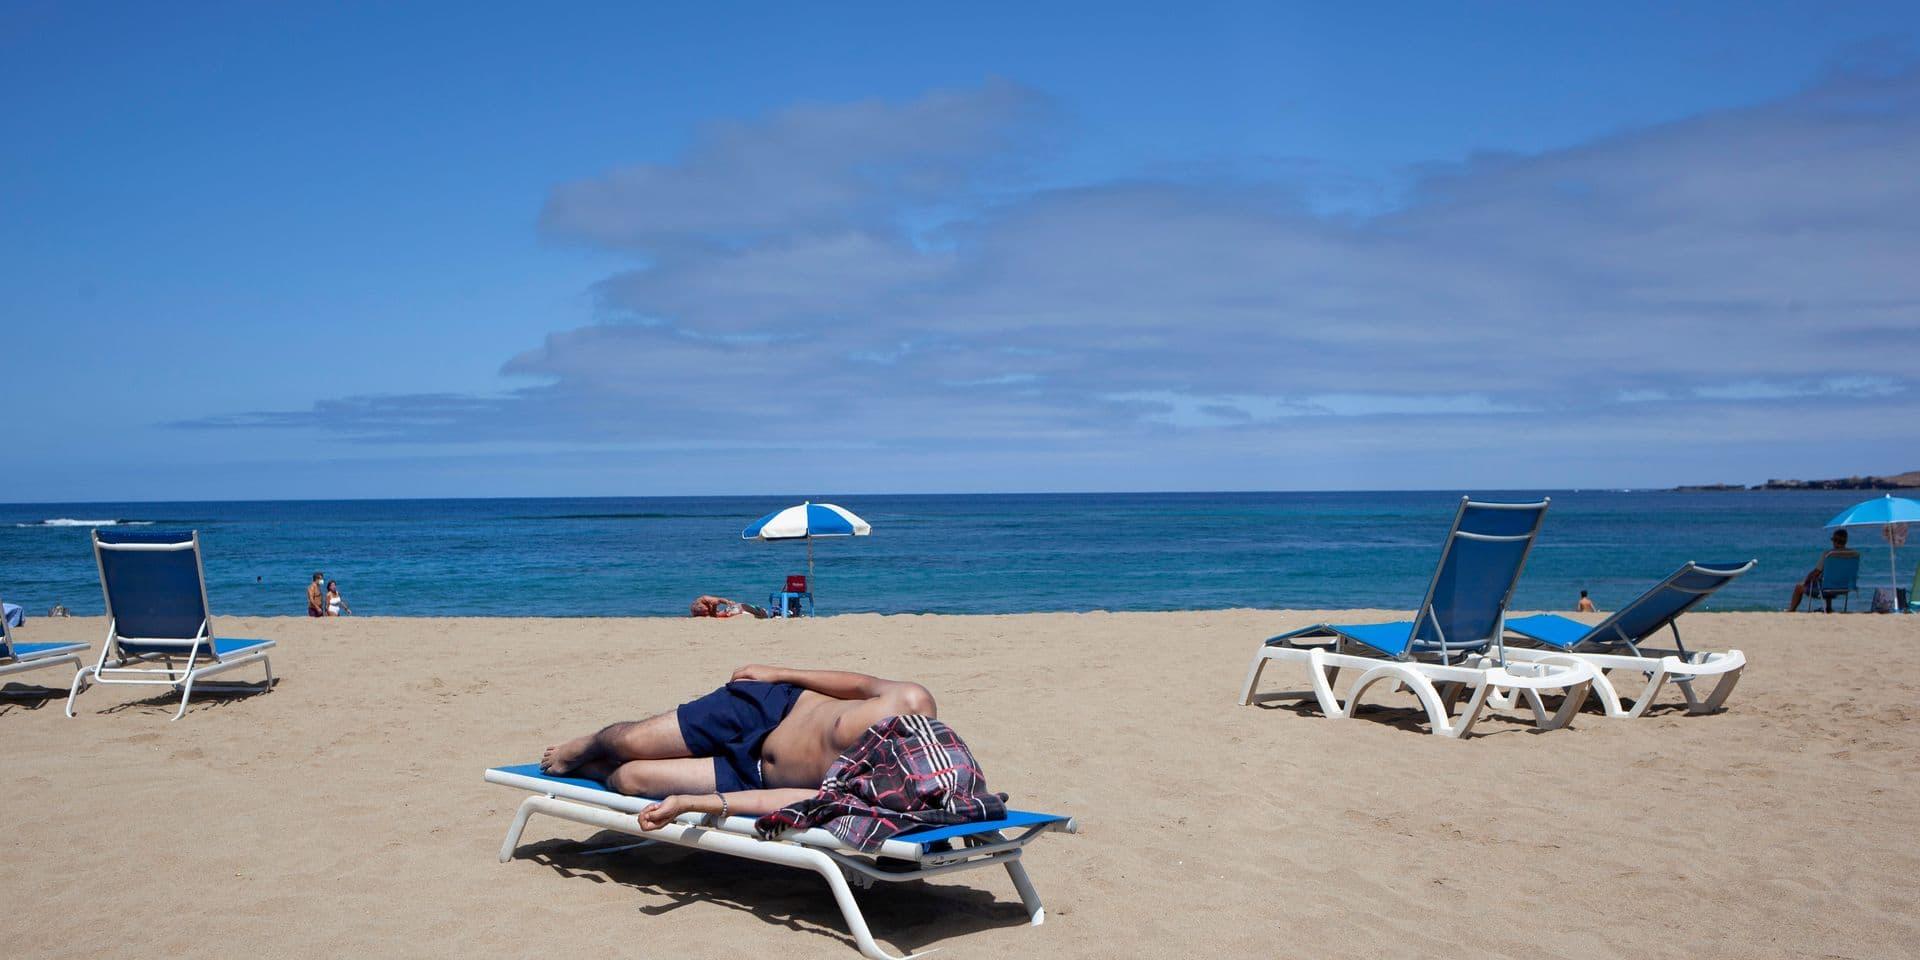 Coronavirus - Tourism in the Canary Islands